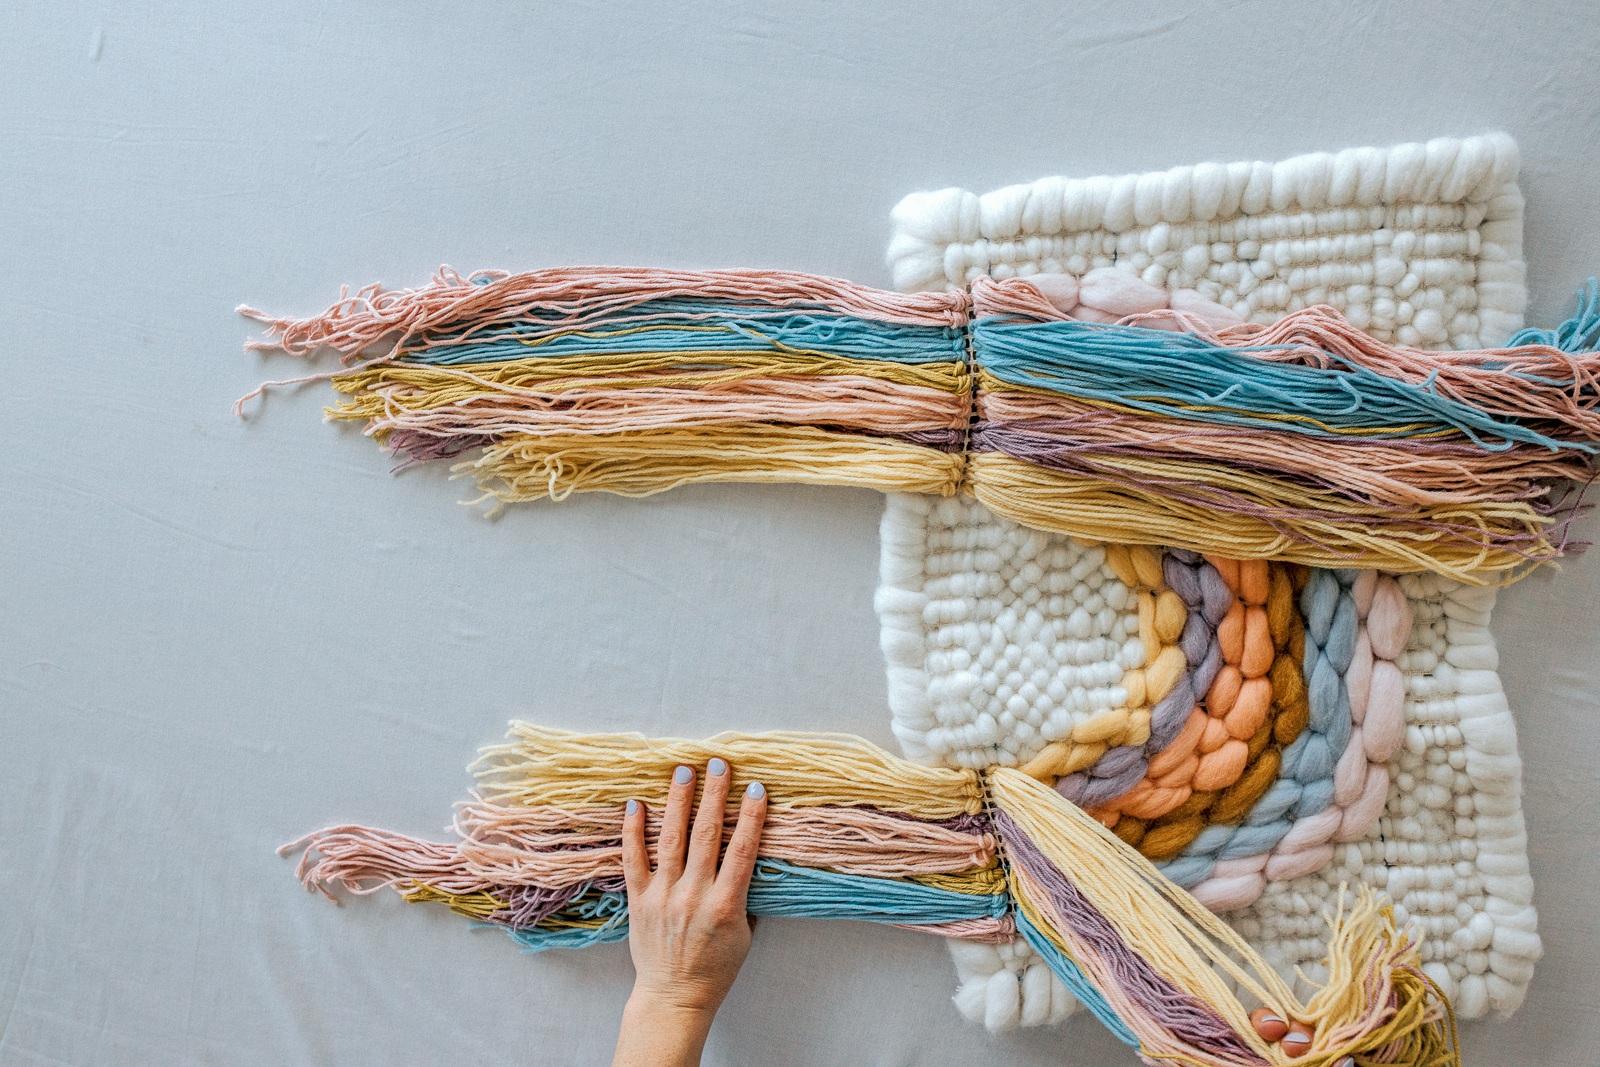 14_Tassels_DIY_Rainbow_Wall_Hanging_by_Clever_Poppy.jpg